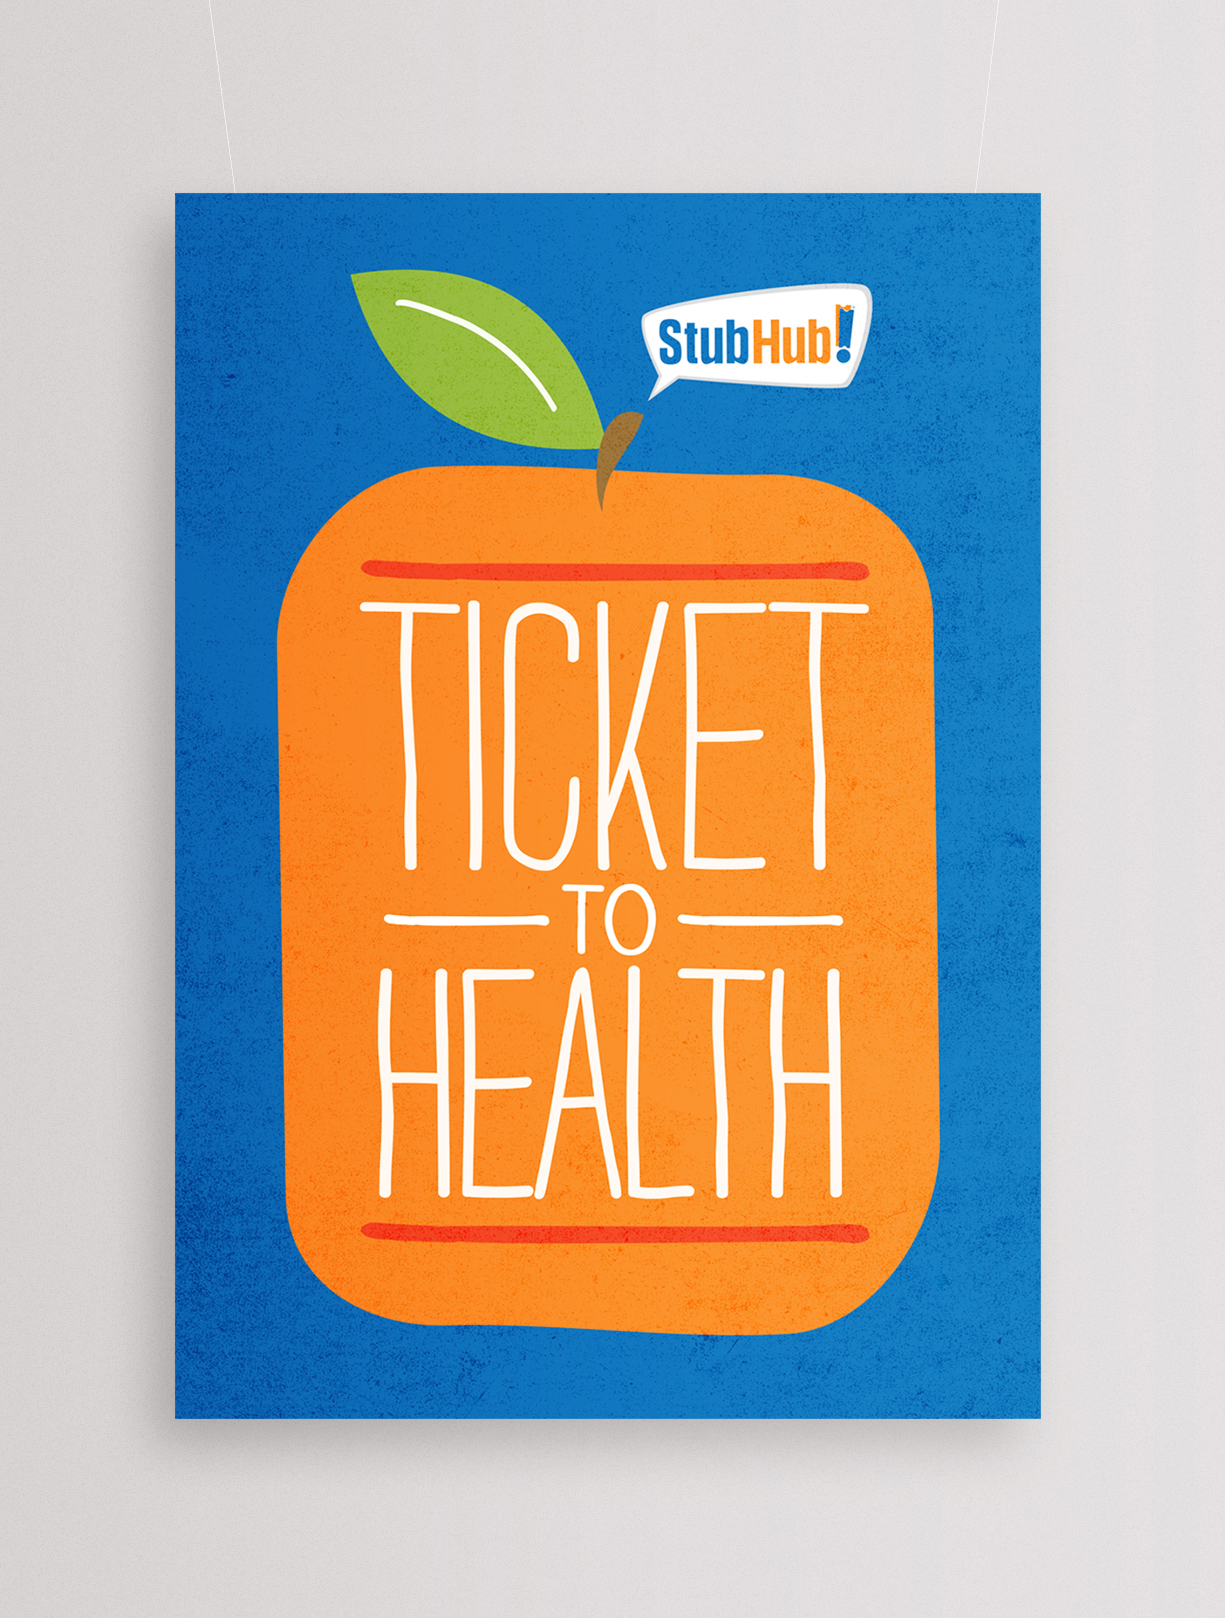 stubhub_Ticket-to-Health_Poster.jpg